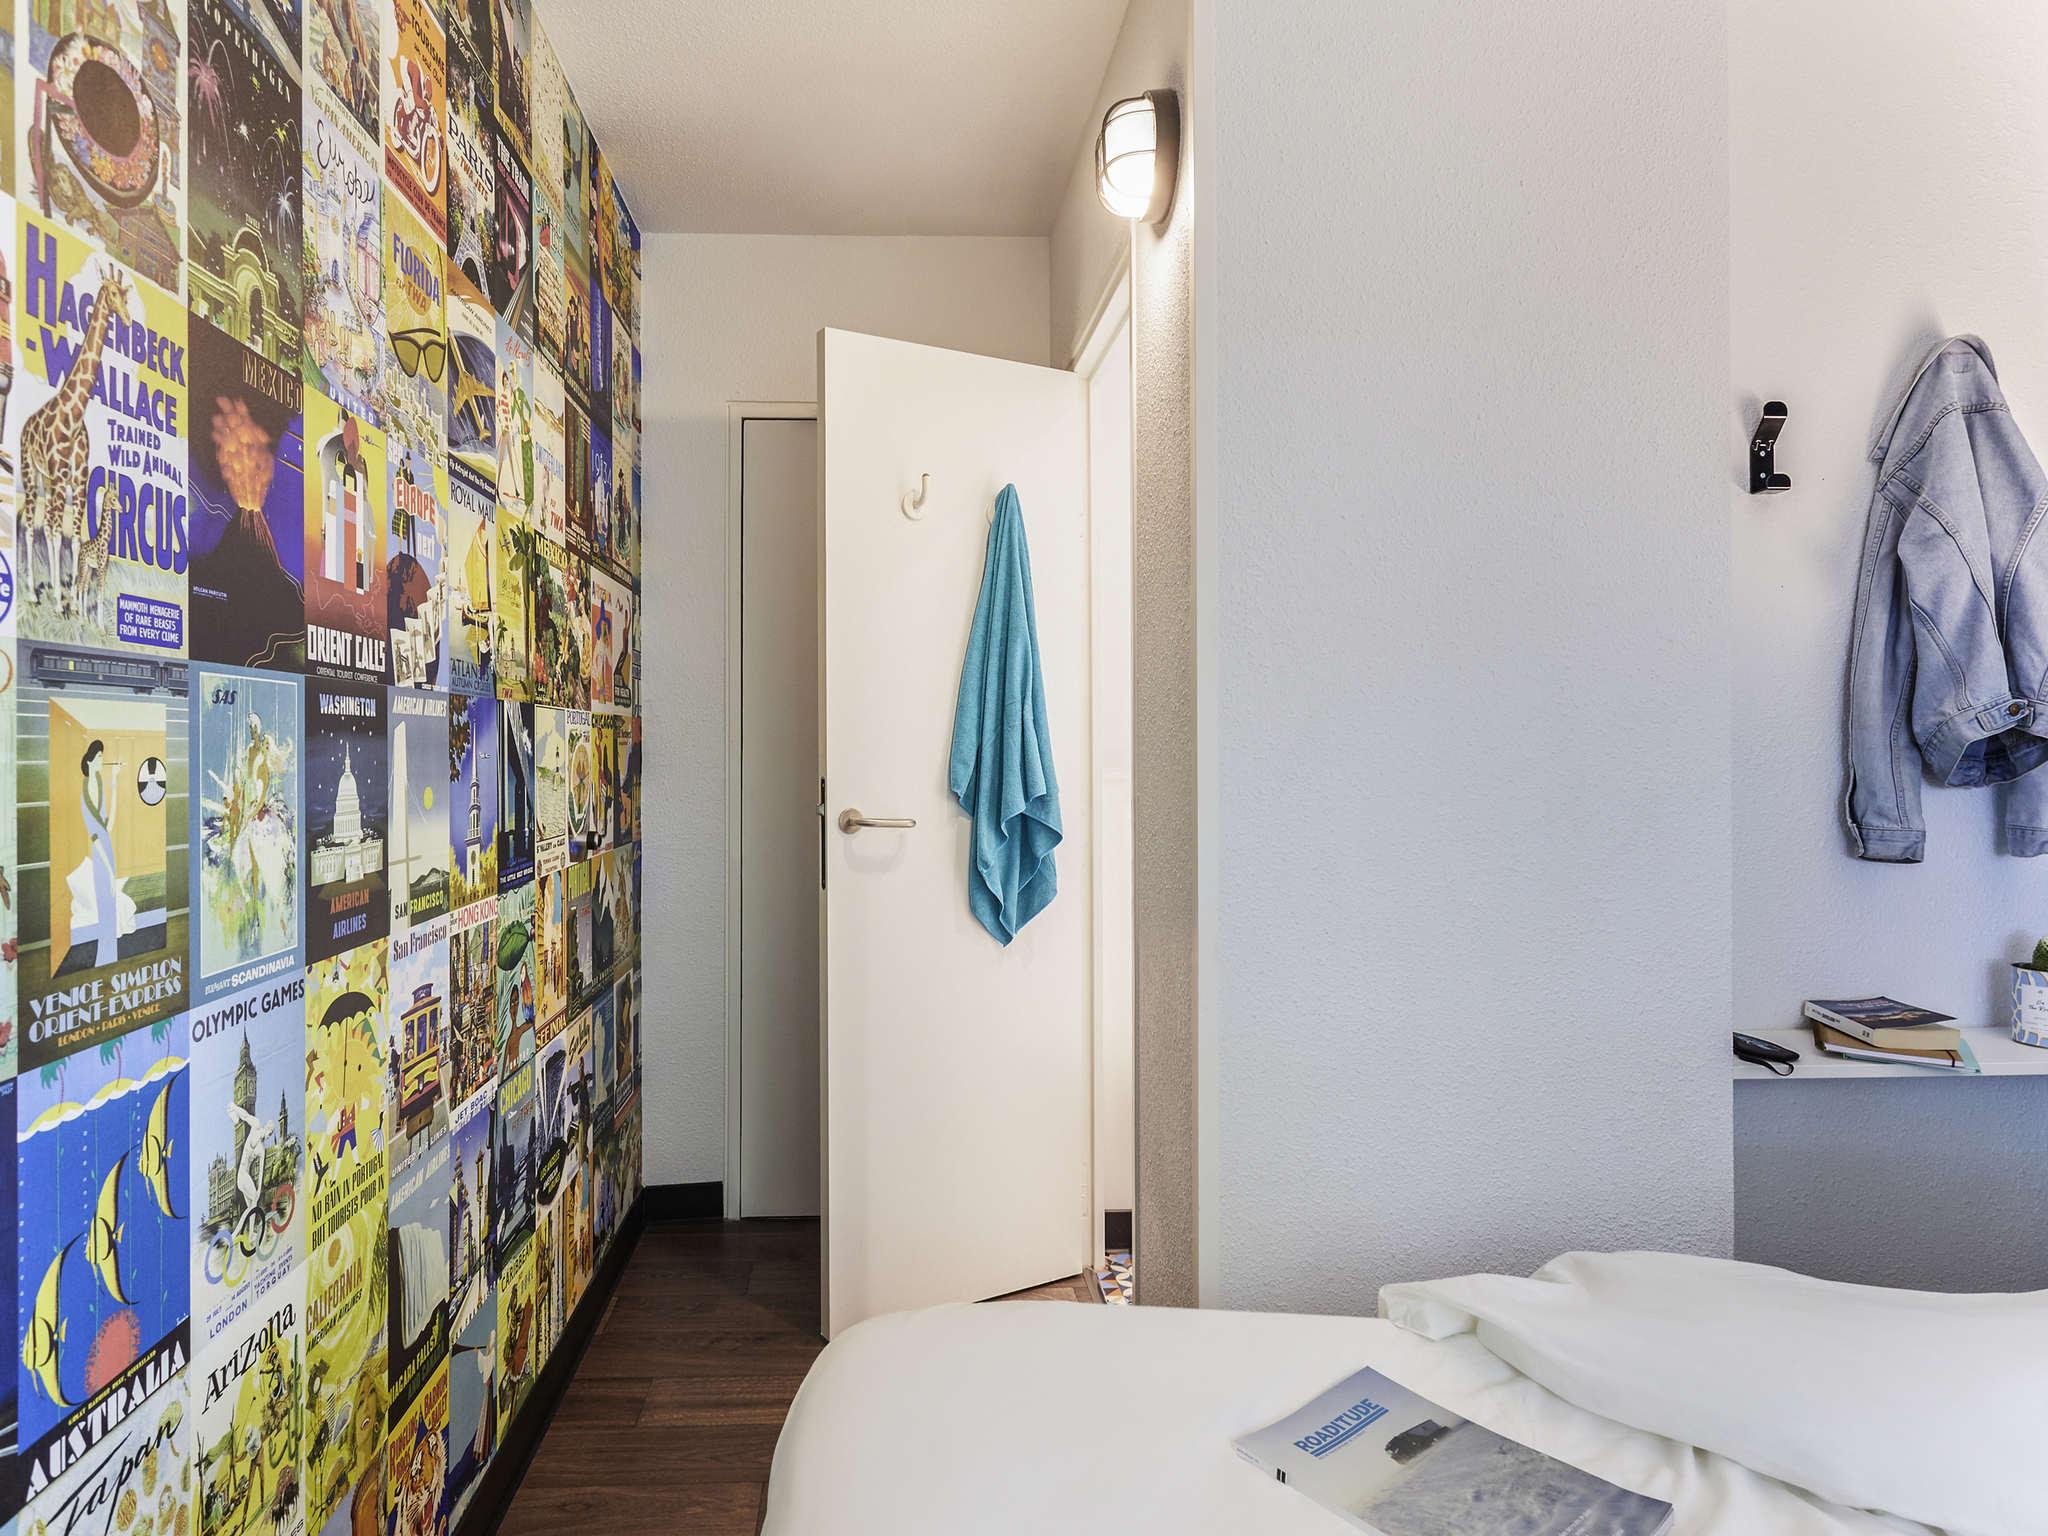 Hôtel - hotelF1 Clermont-Ferrand Est